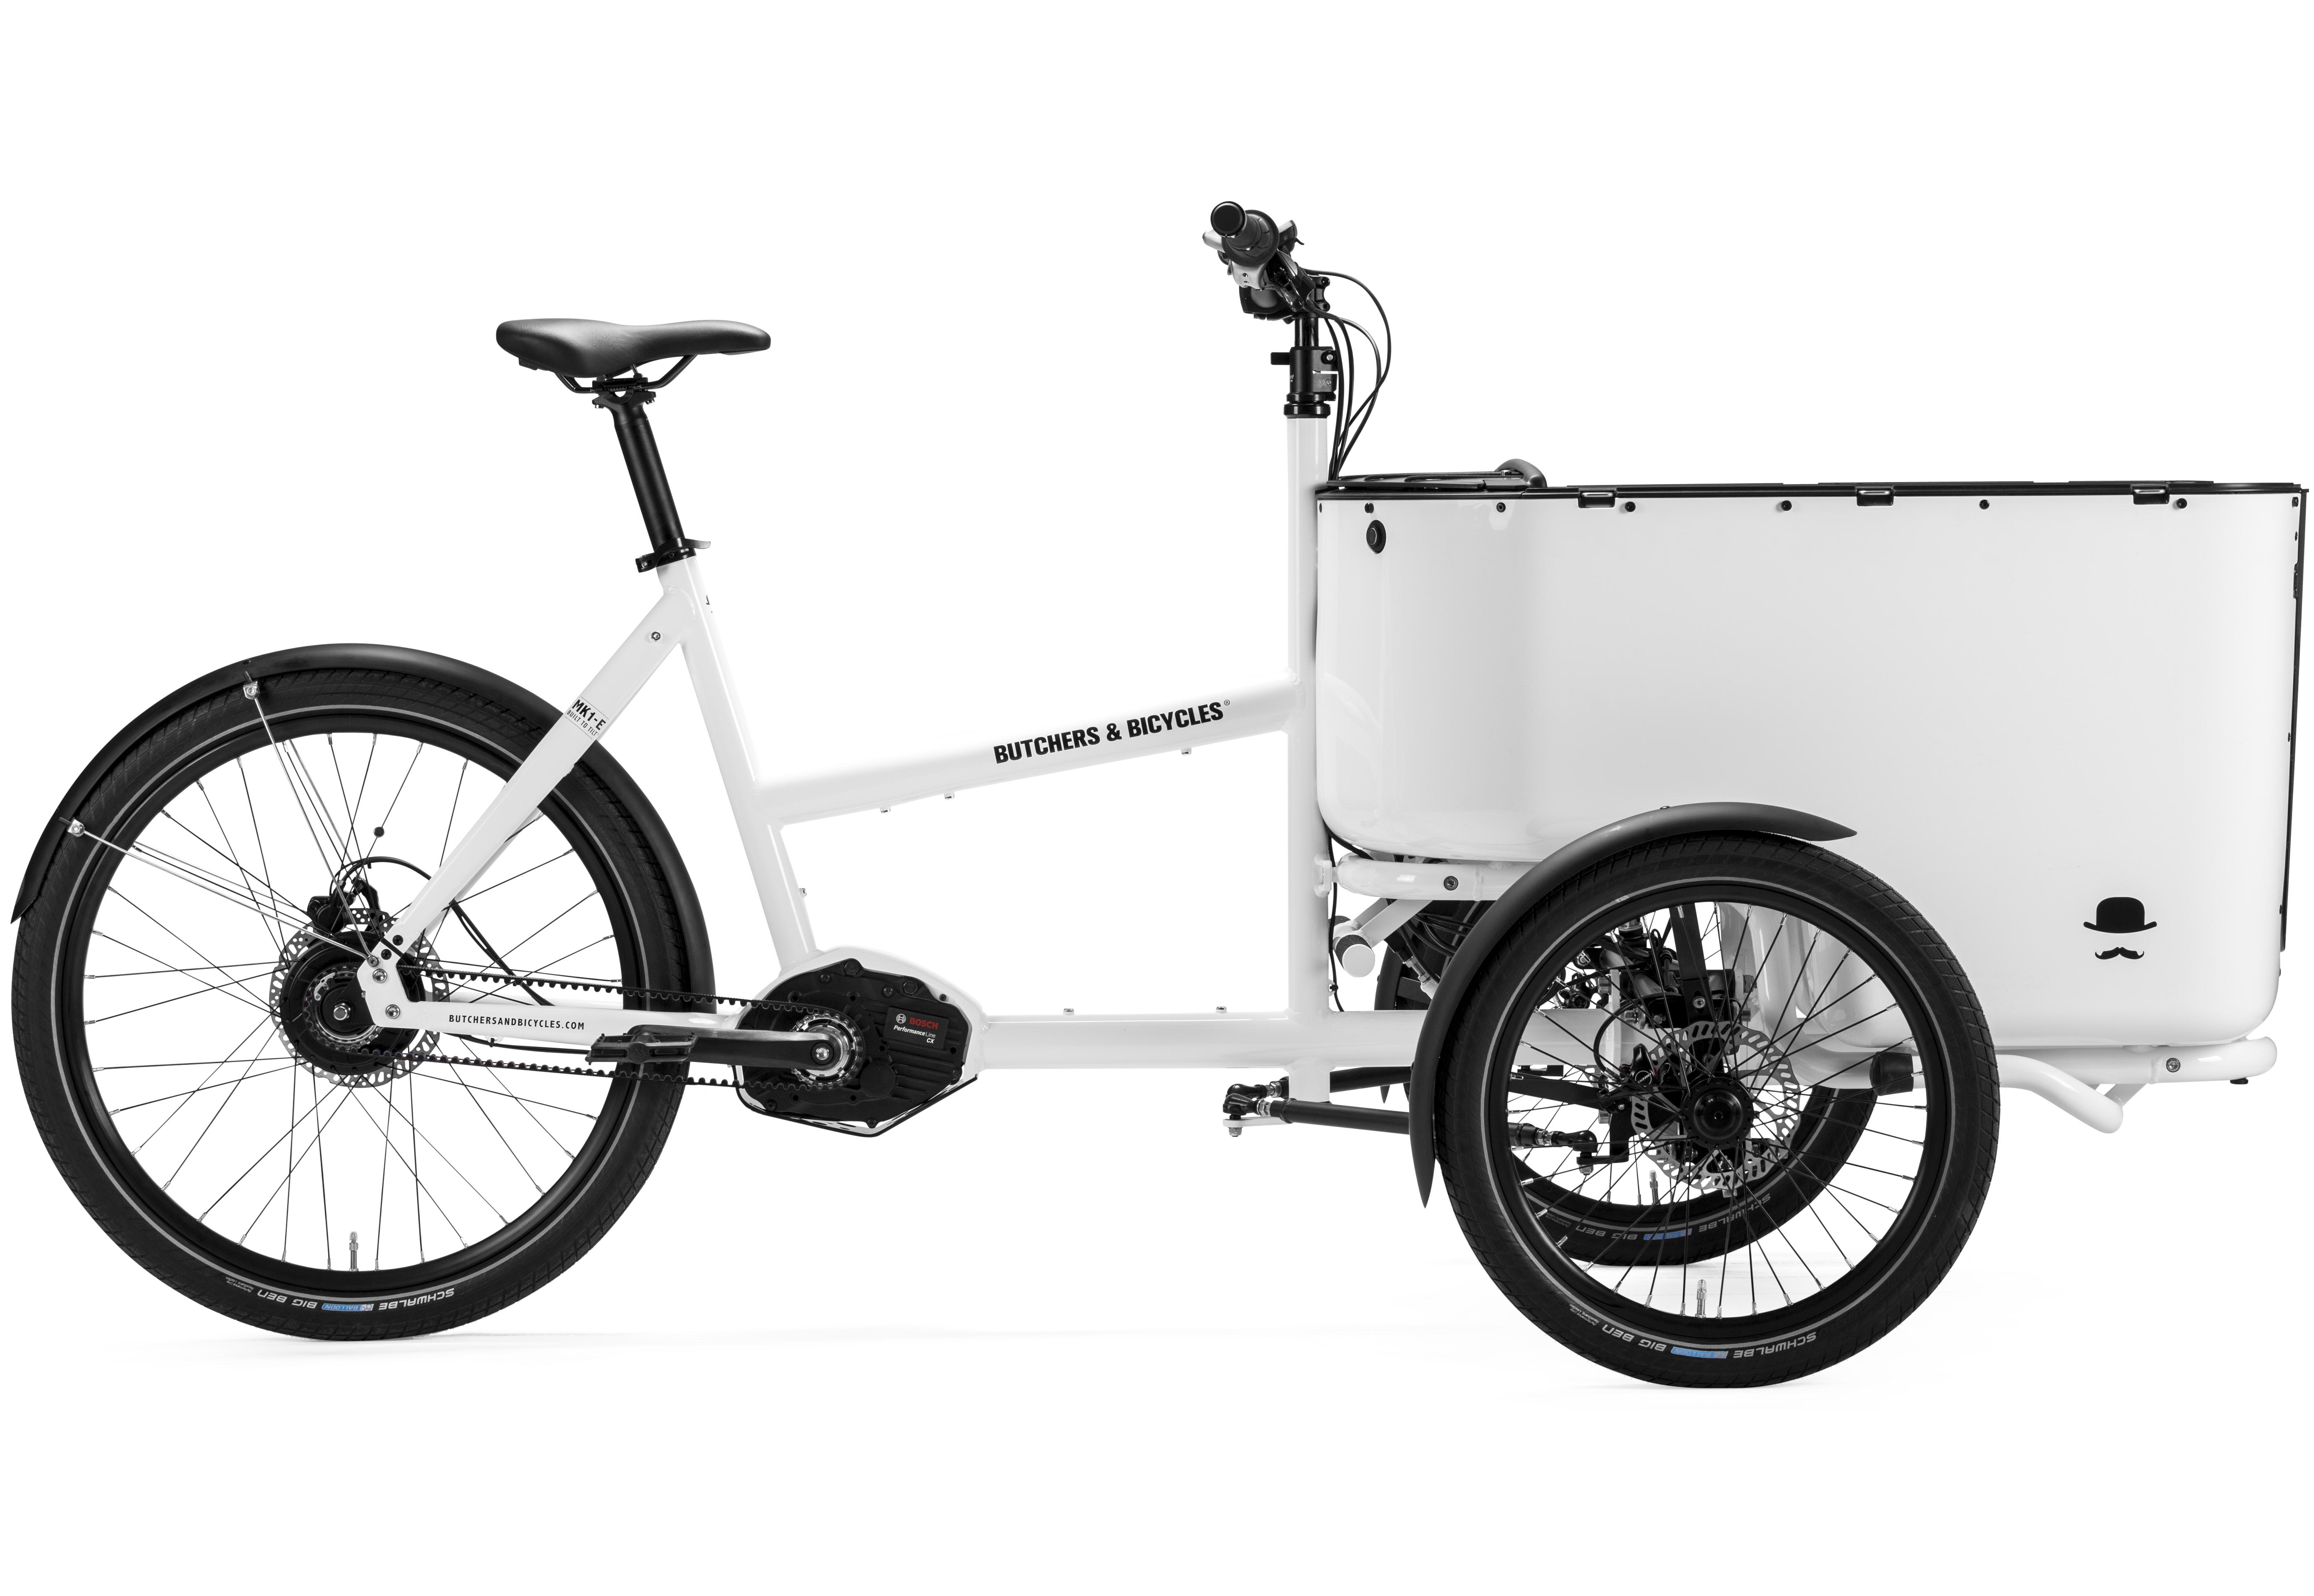 Butchers & Bicycles Lastendreirad MK1-E